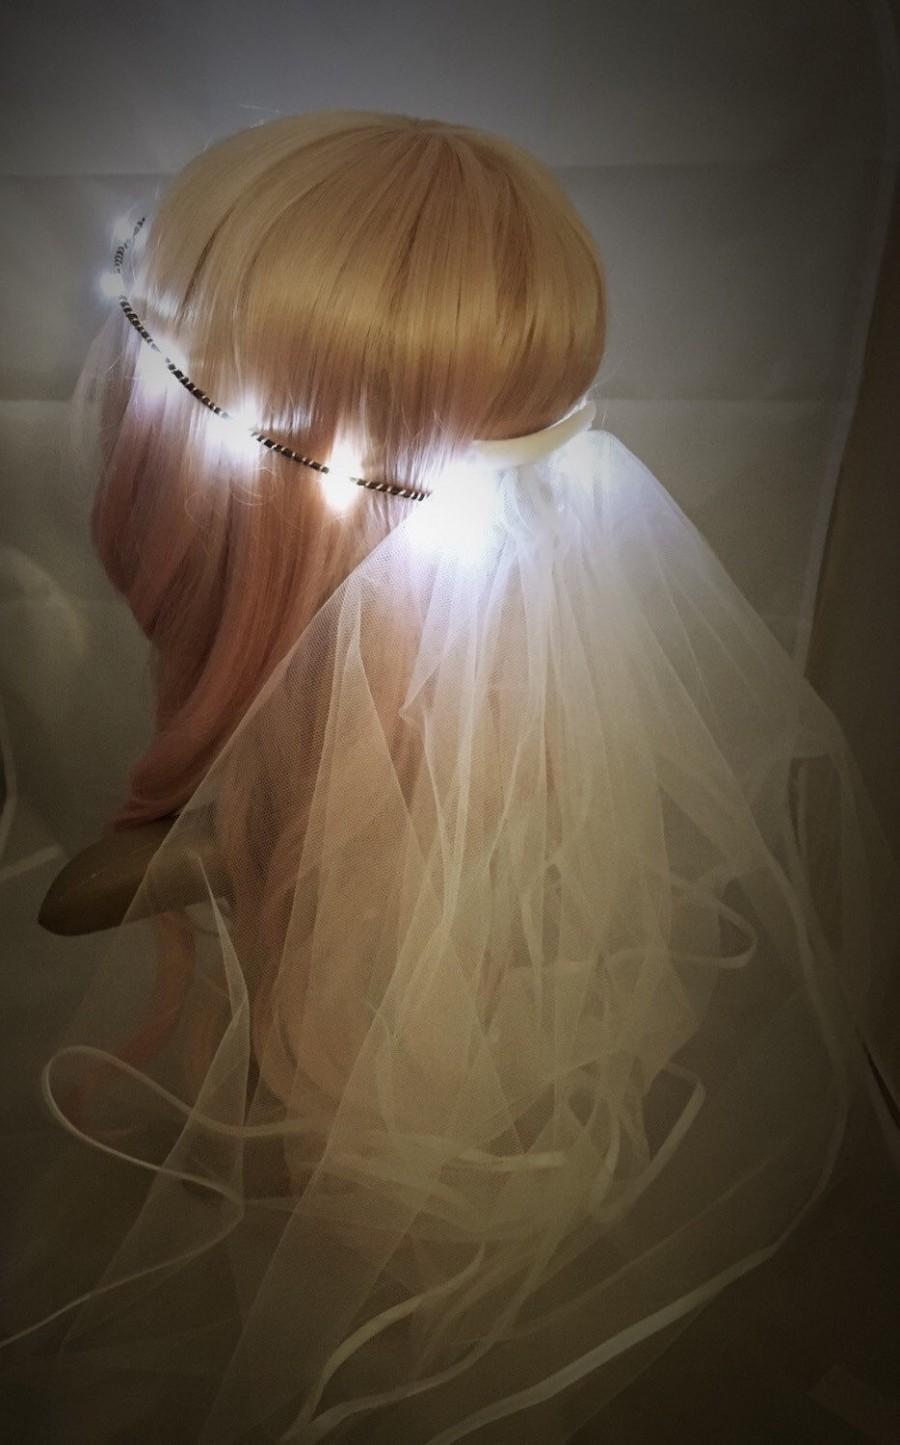 Hochzeit - Bridal Veil LED Crown, perfect for bachelorette parties, festival weddings, night ceremonies, wedding receptions, bridal gift